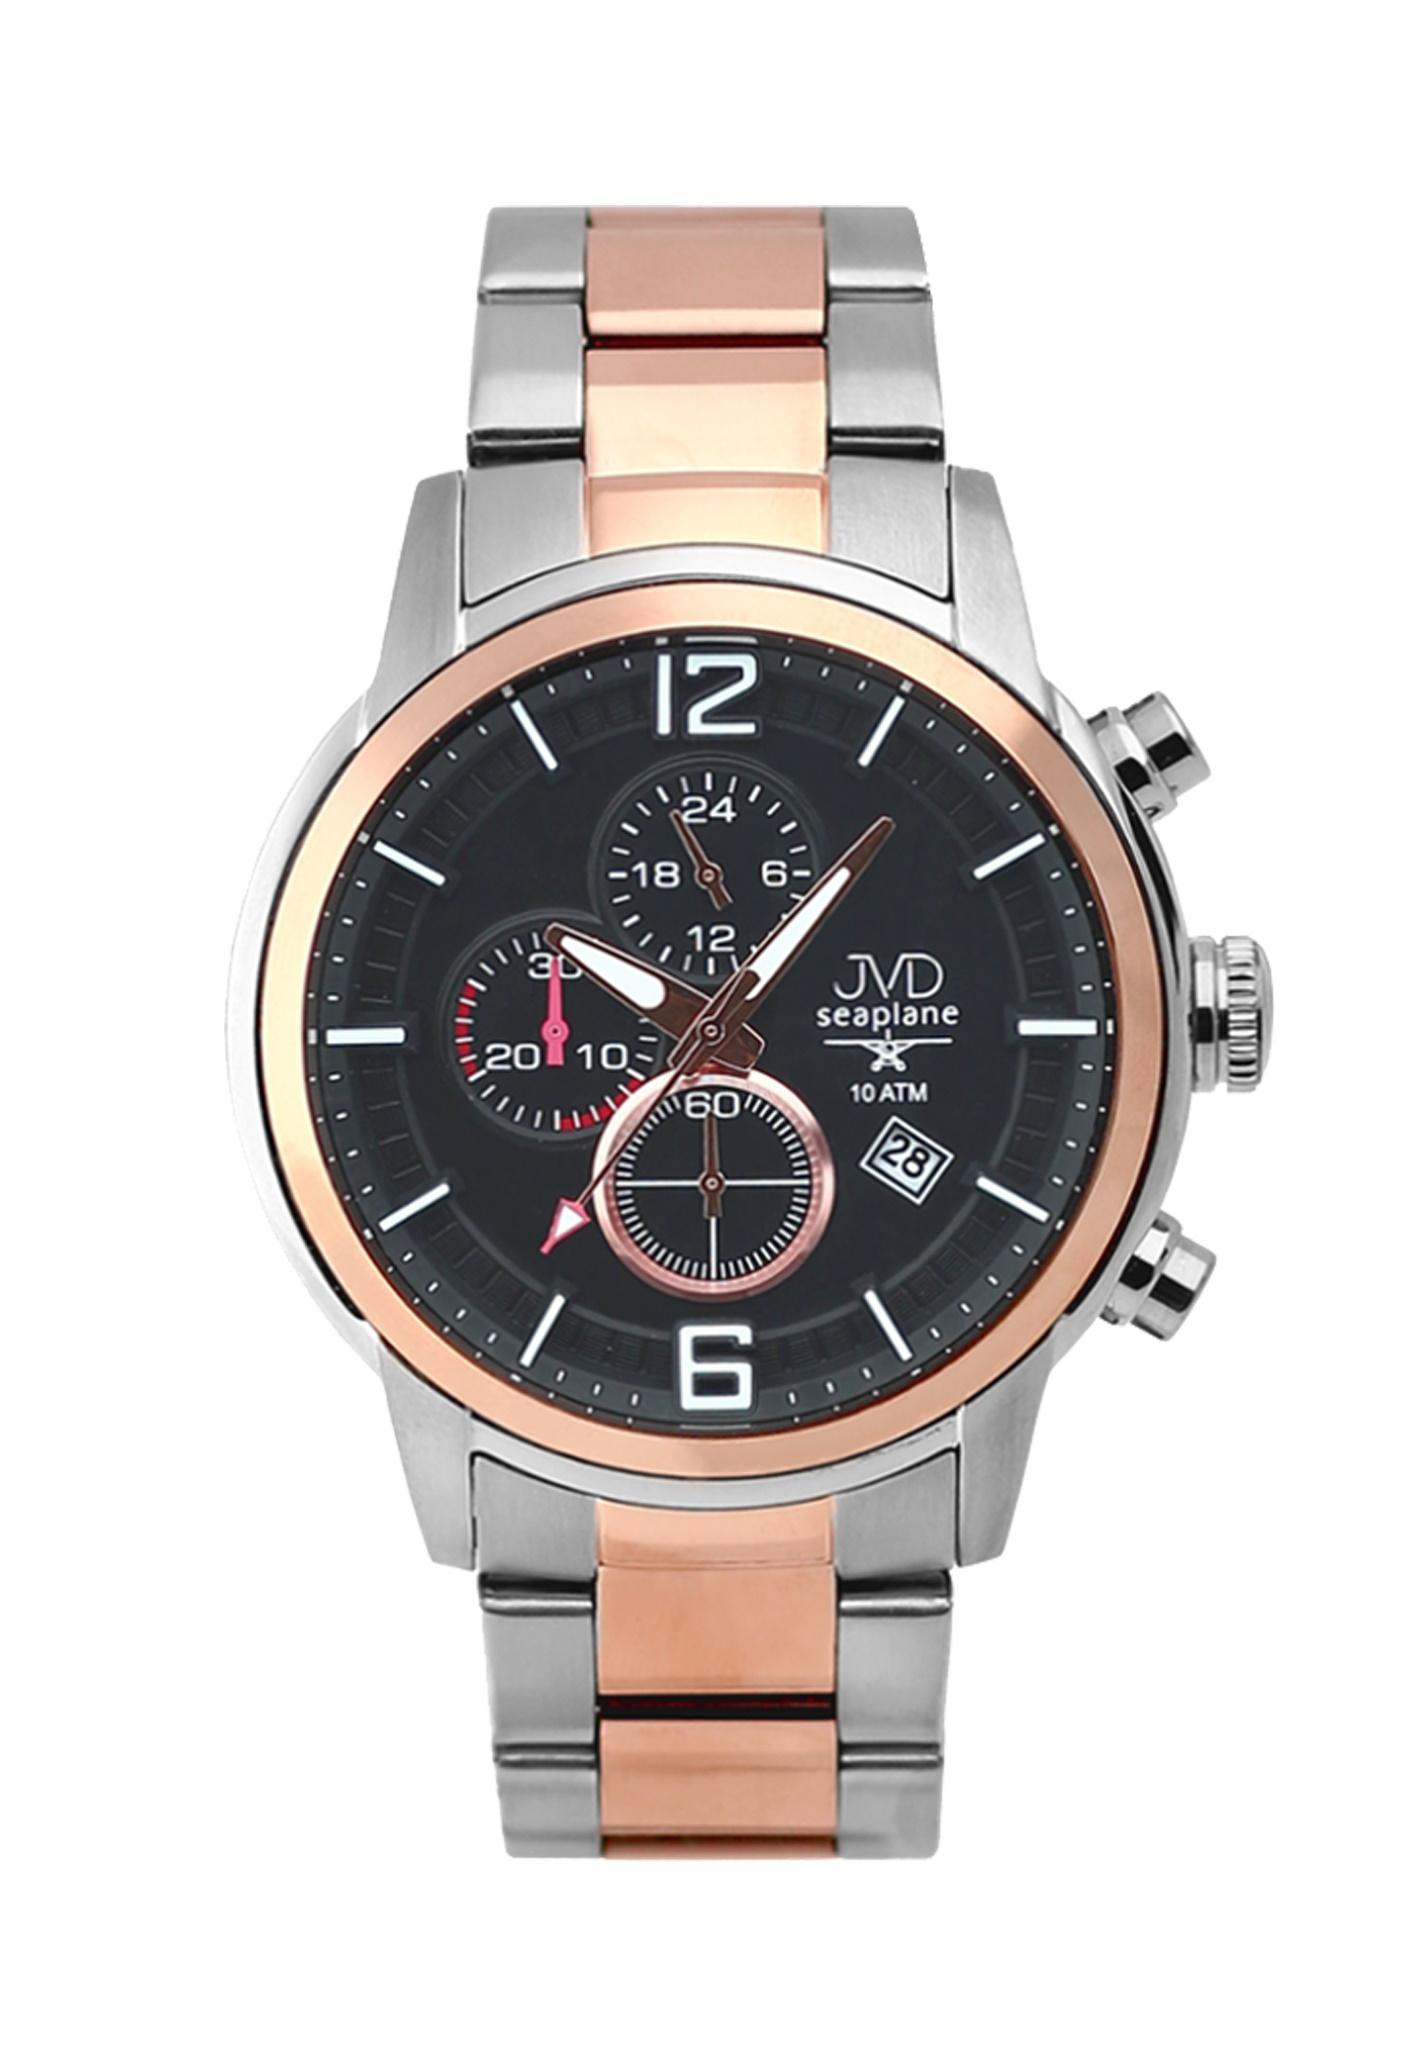 Vysoce odolné vodotěsné chronografy hodinky JVD Seaplane METEOR JC667.6 (POŠTOVNÉ ZDARMA!!)